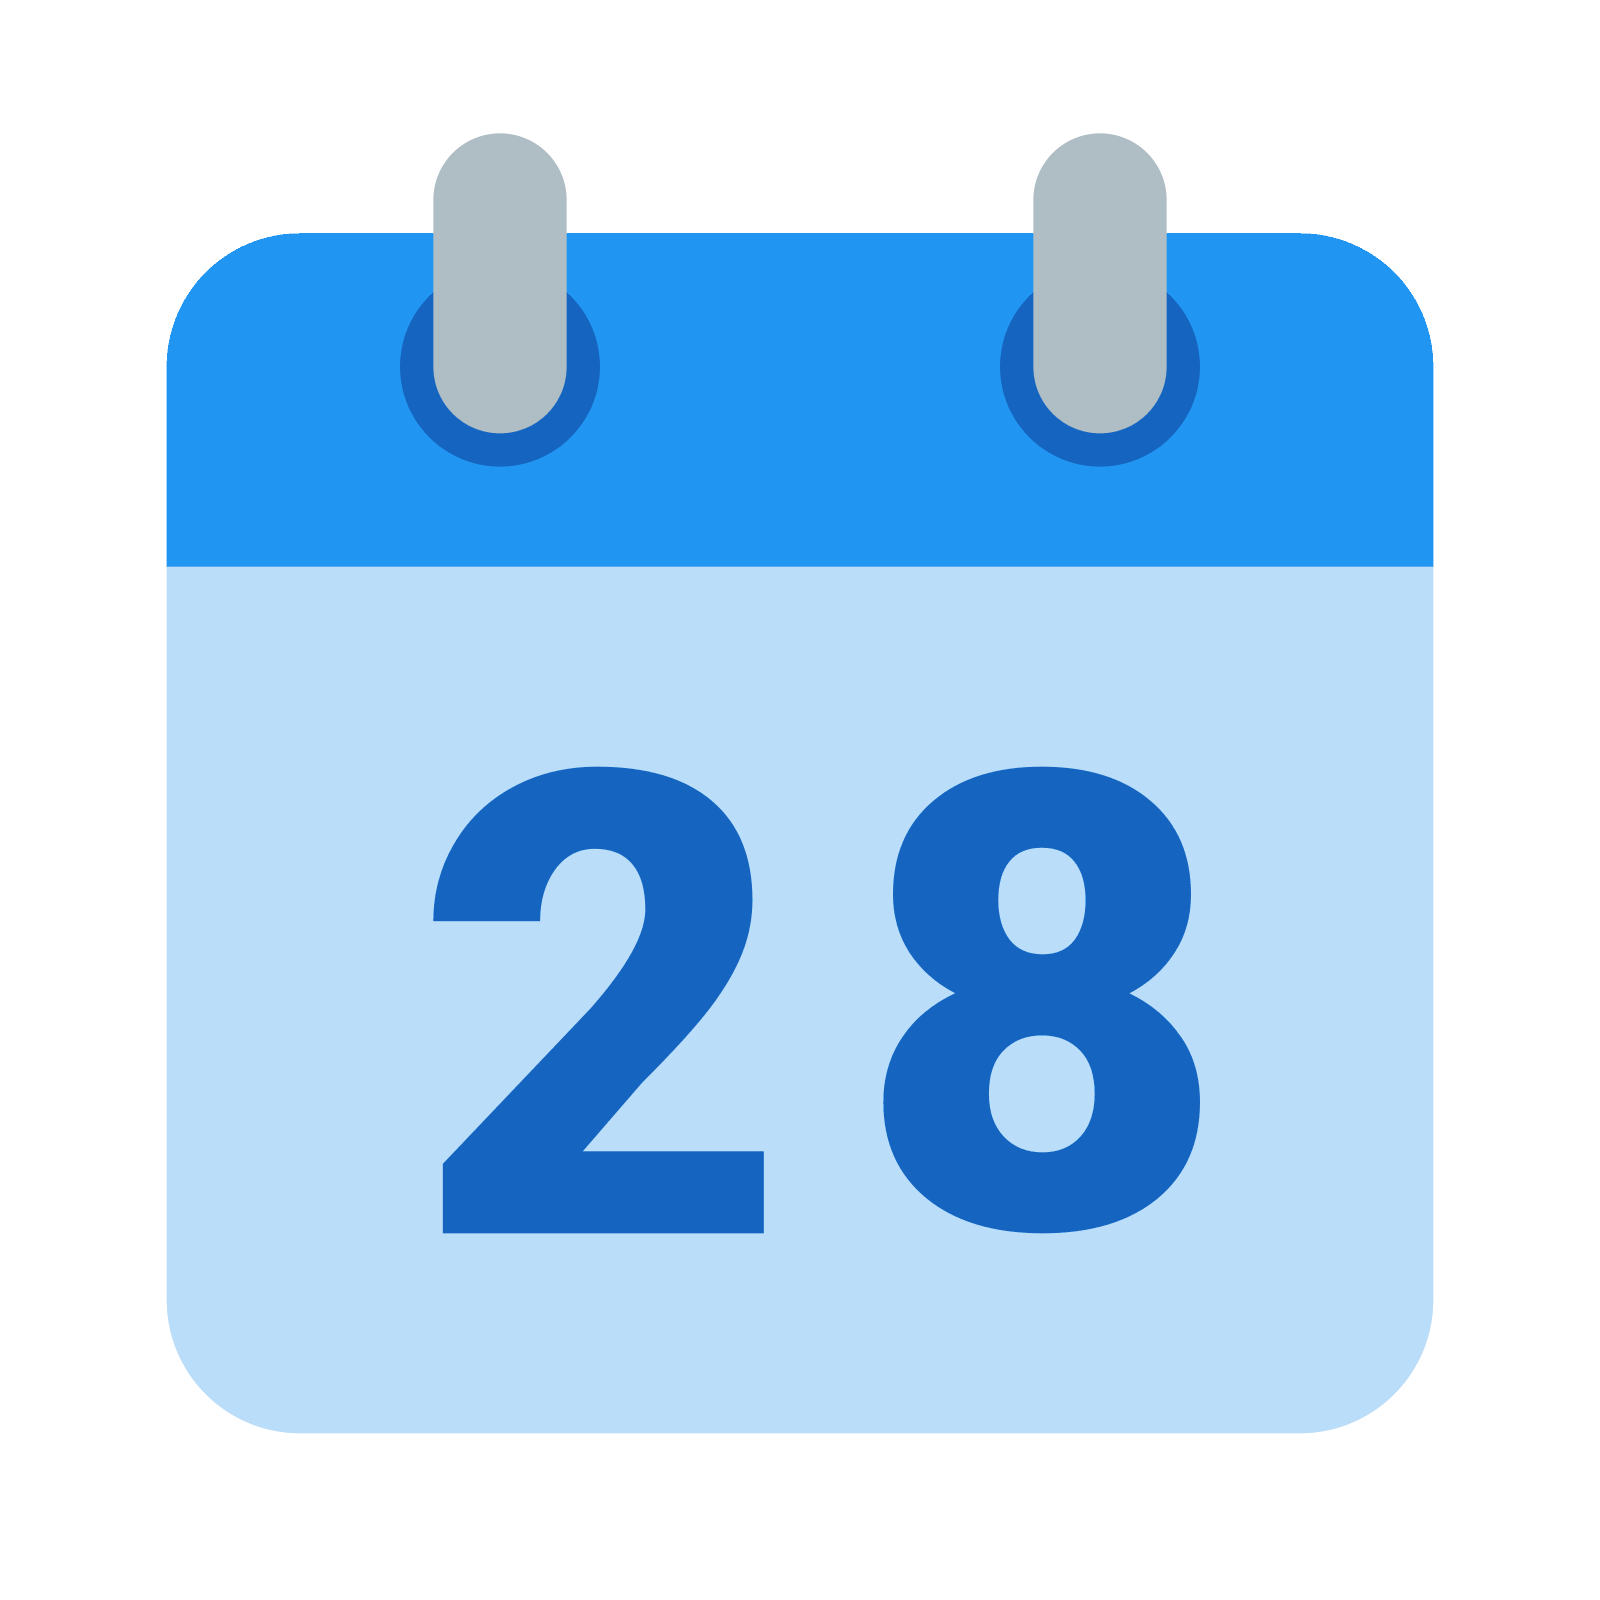 Computer icons download color. Clipart calendar calendar time